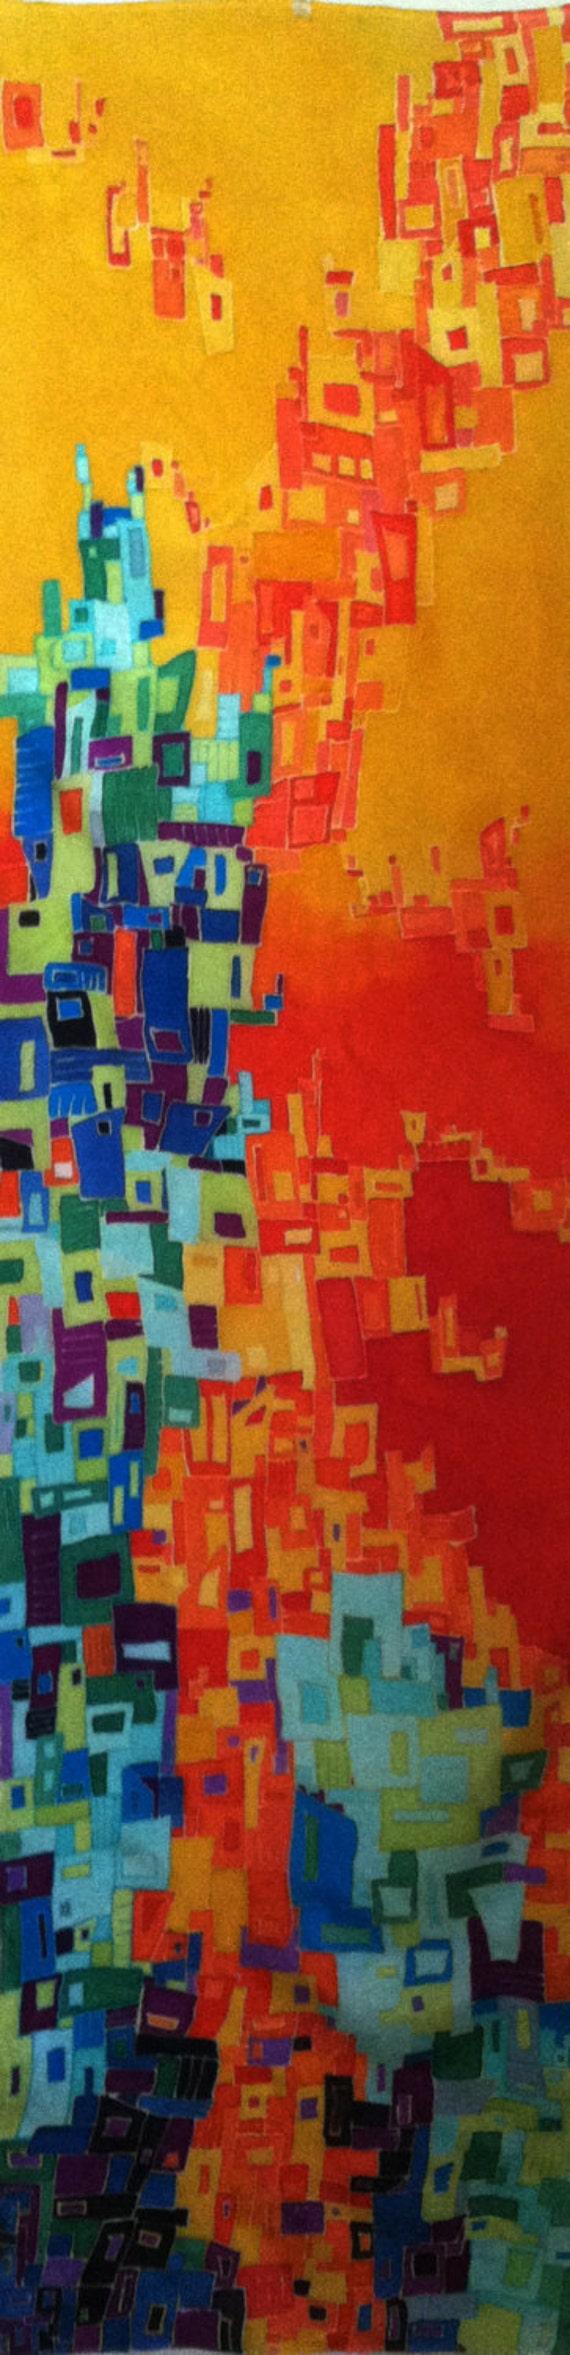 FALLING APART -Hand Painted Silk Wall Hanging